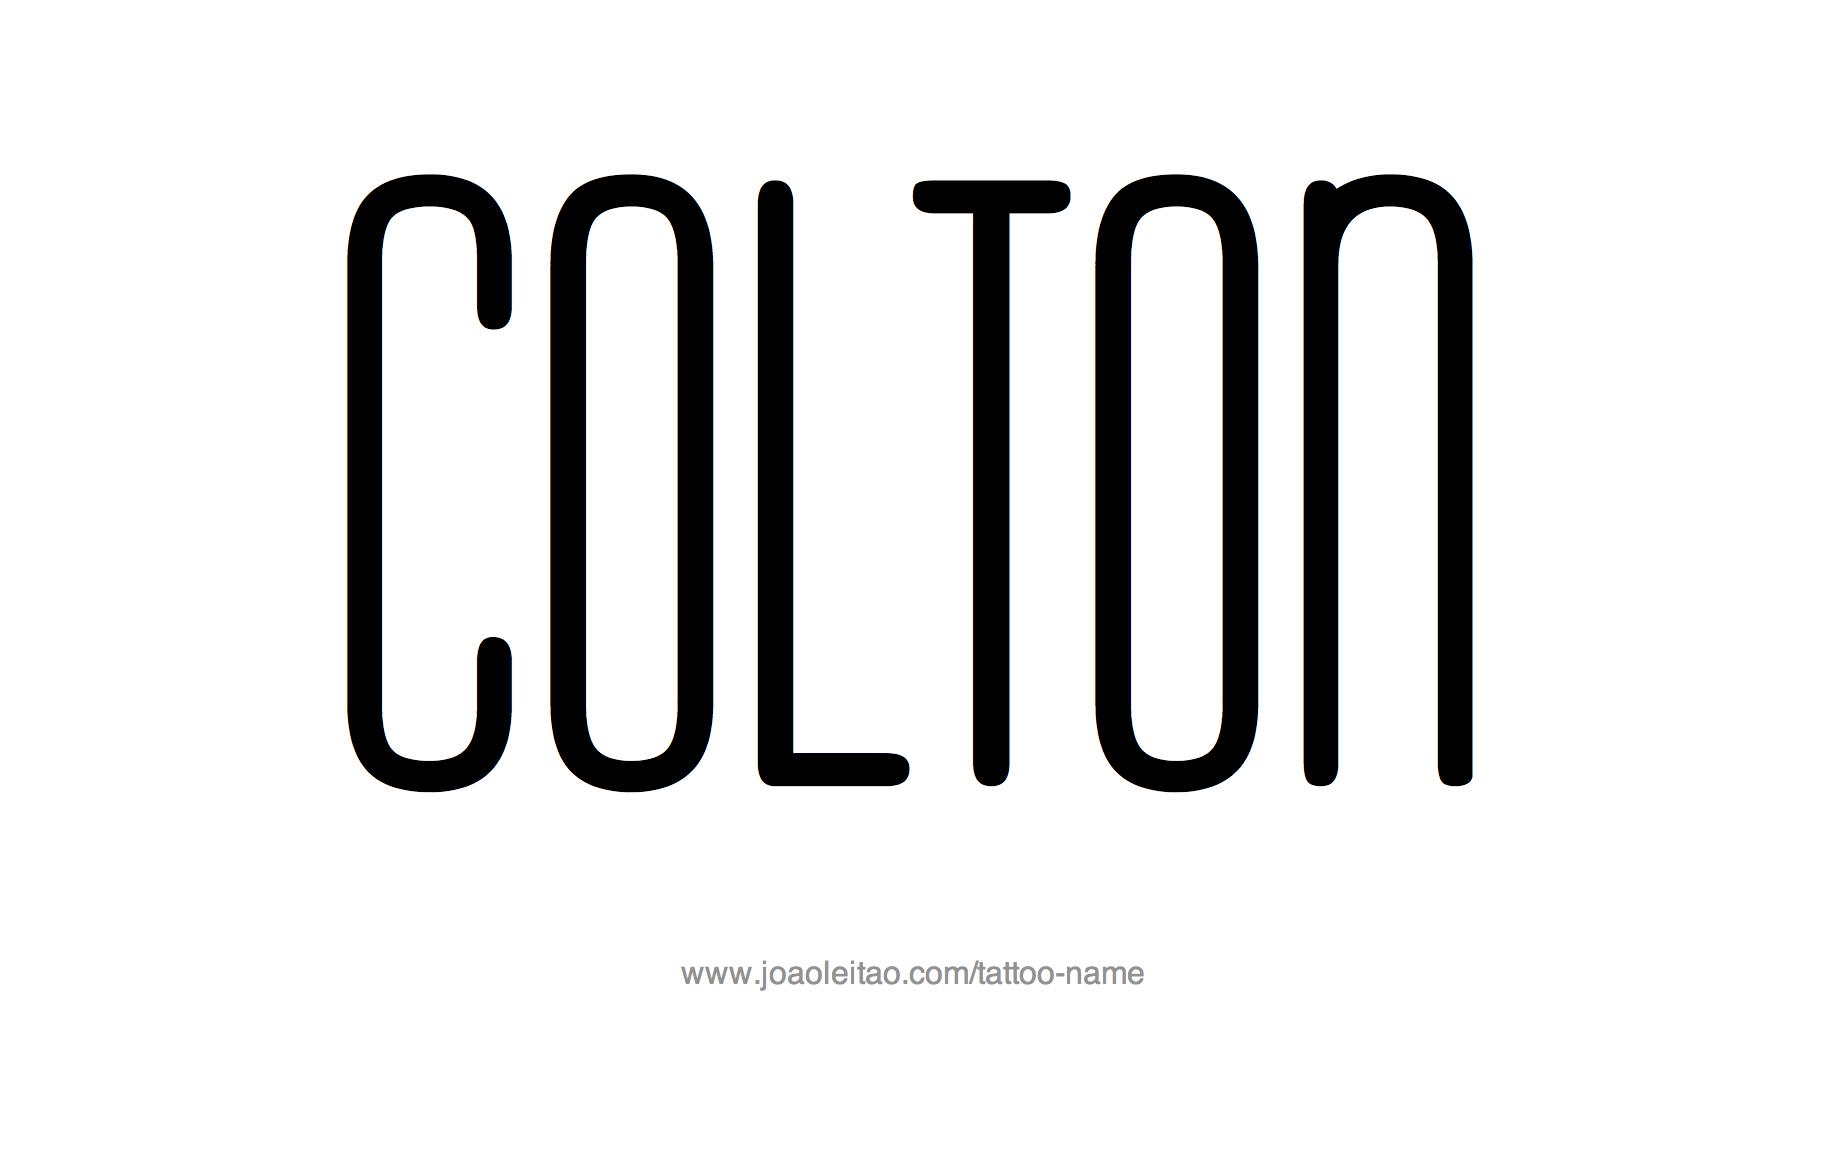 Tattoo Design Name Colton